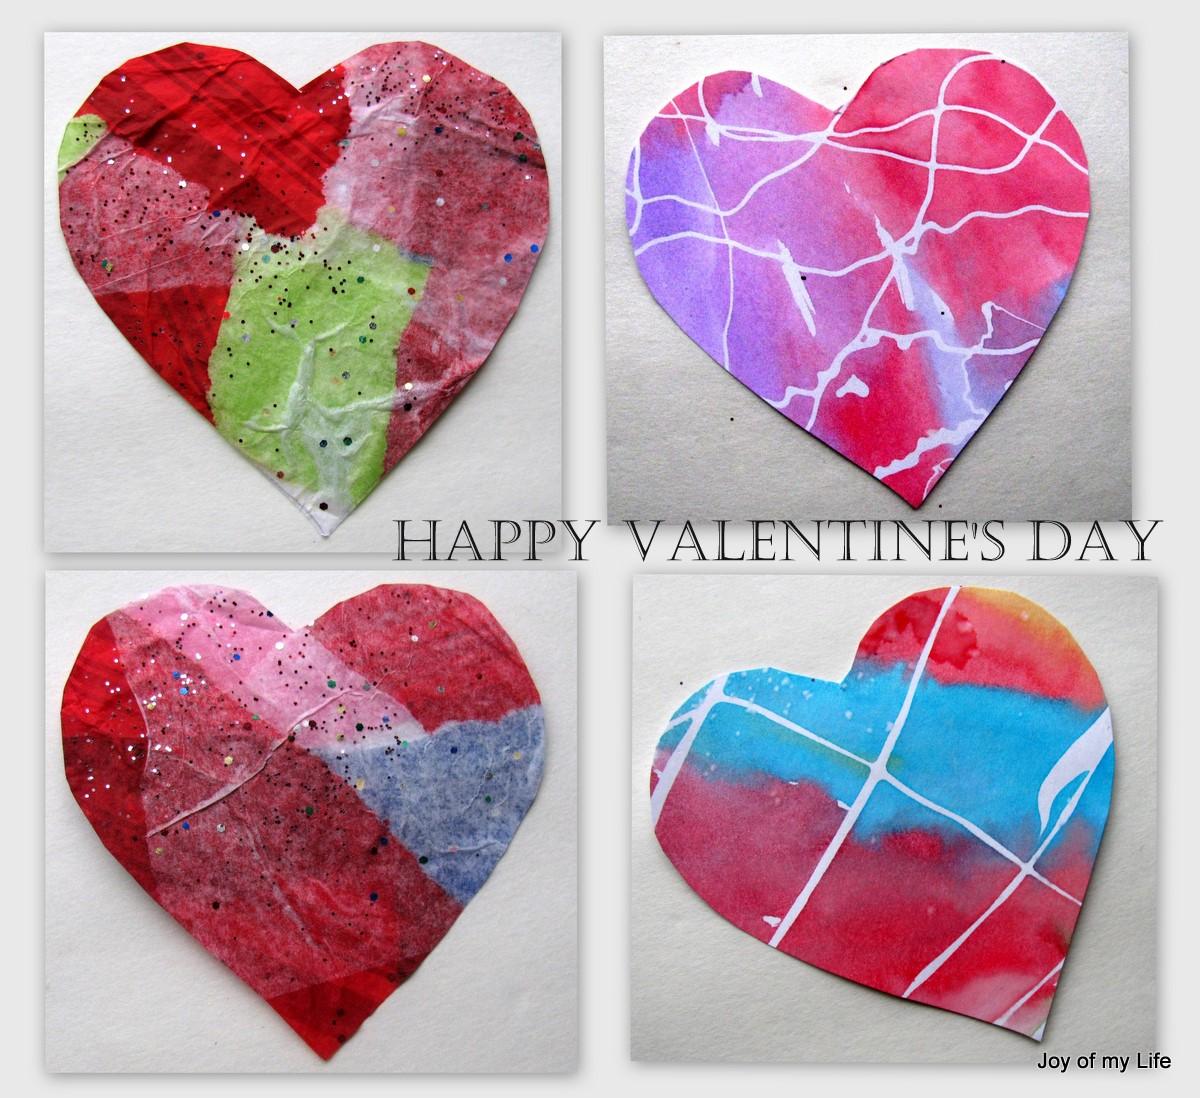 Valentine craft ideas for kindergarten - Valentine Craft Ideas For Kindergarten Make These Easy Yarn Hearts With The Kids